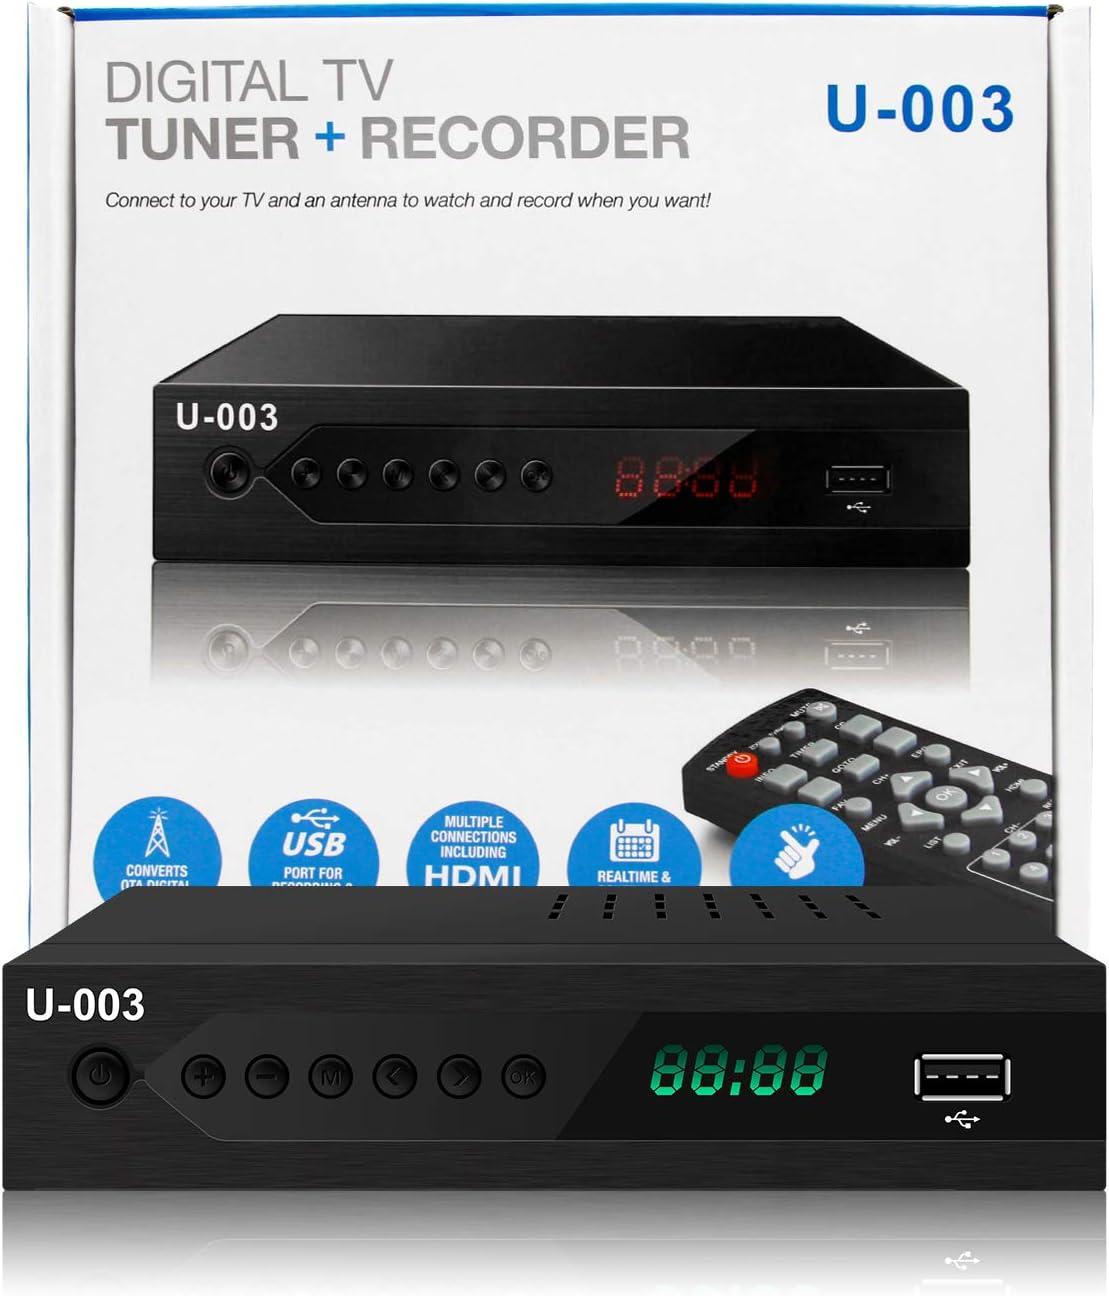 UBISHENG Digital TV Converter Box, 1080P ATSC Converters with PVR Recording&Playback, HDMI Output, Timer Setting LED HDTV Set Top Box